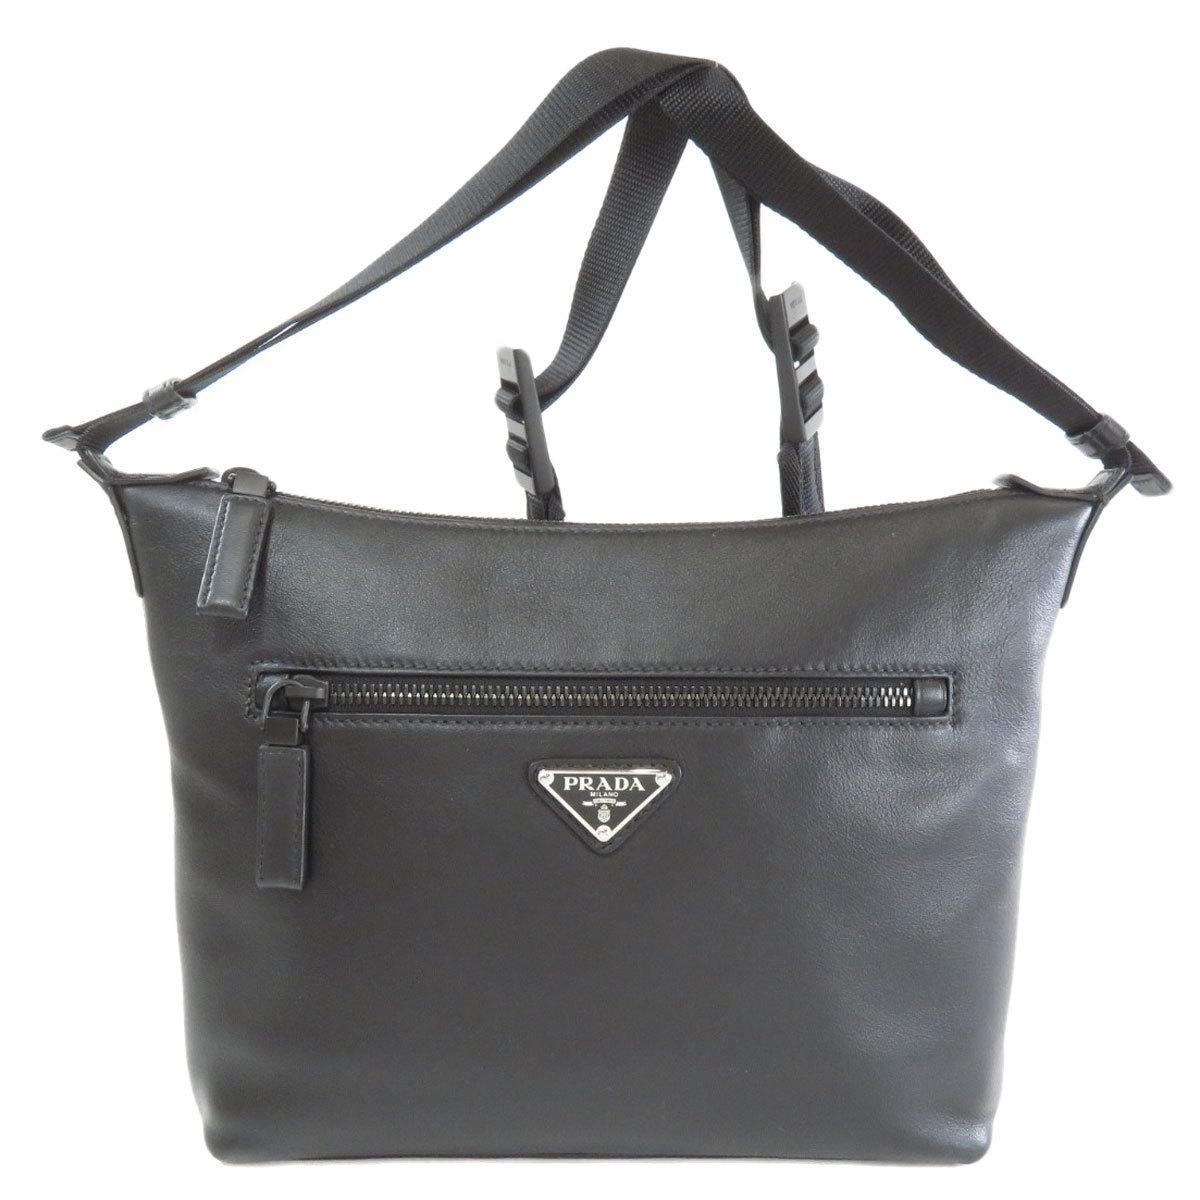 Prada 2VH078 logo plate shoulder bag leather ladies